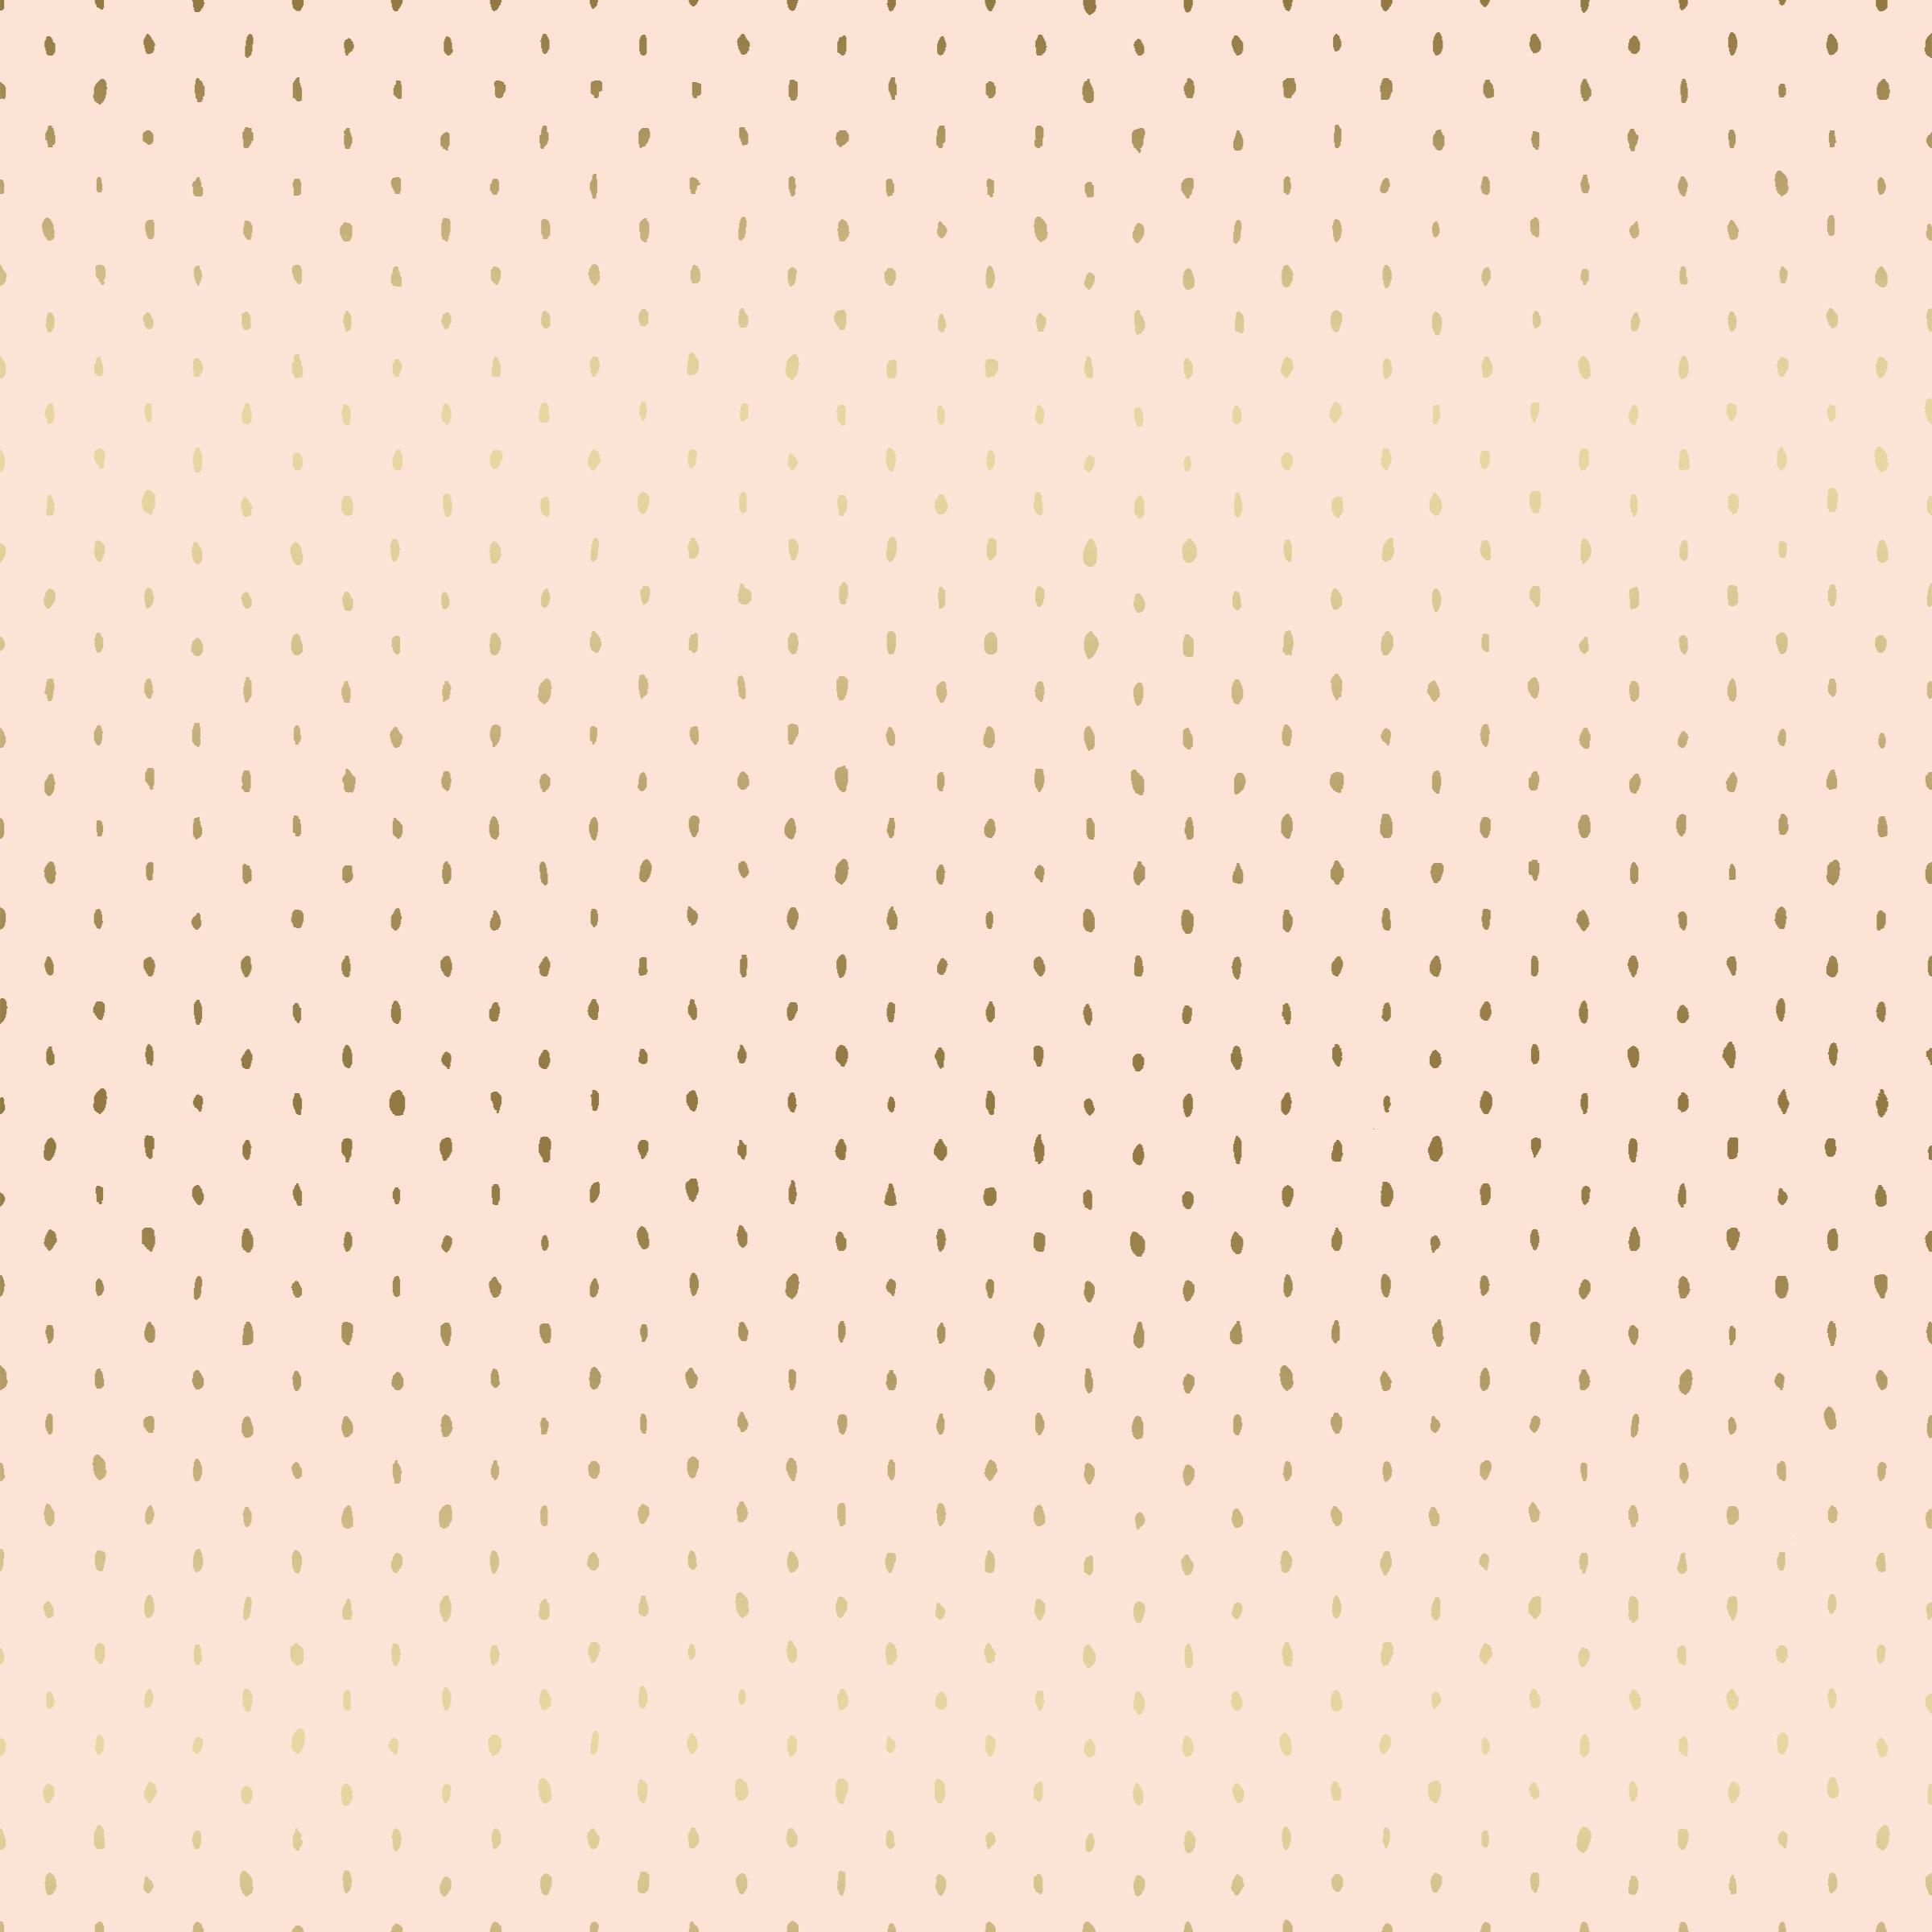 Cotton+Steel Basics - Stitch and Repeat (Blush)